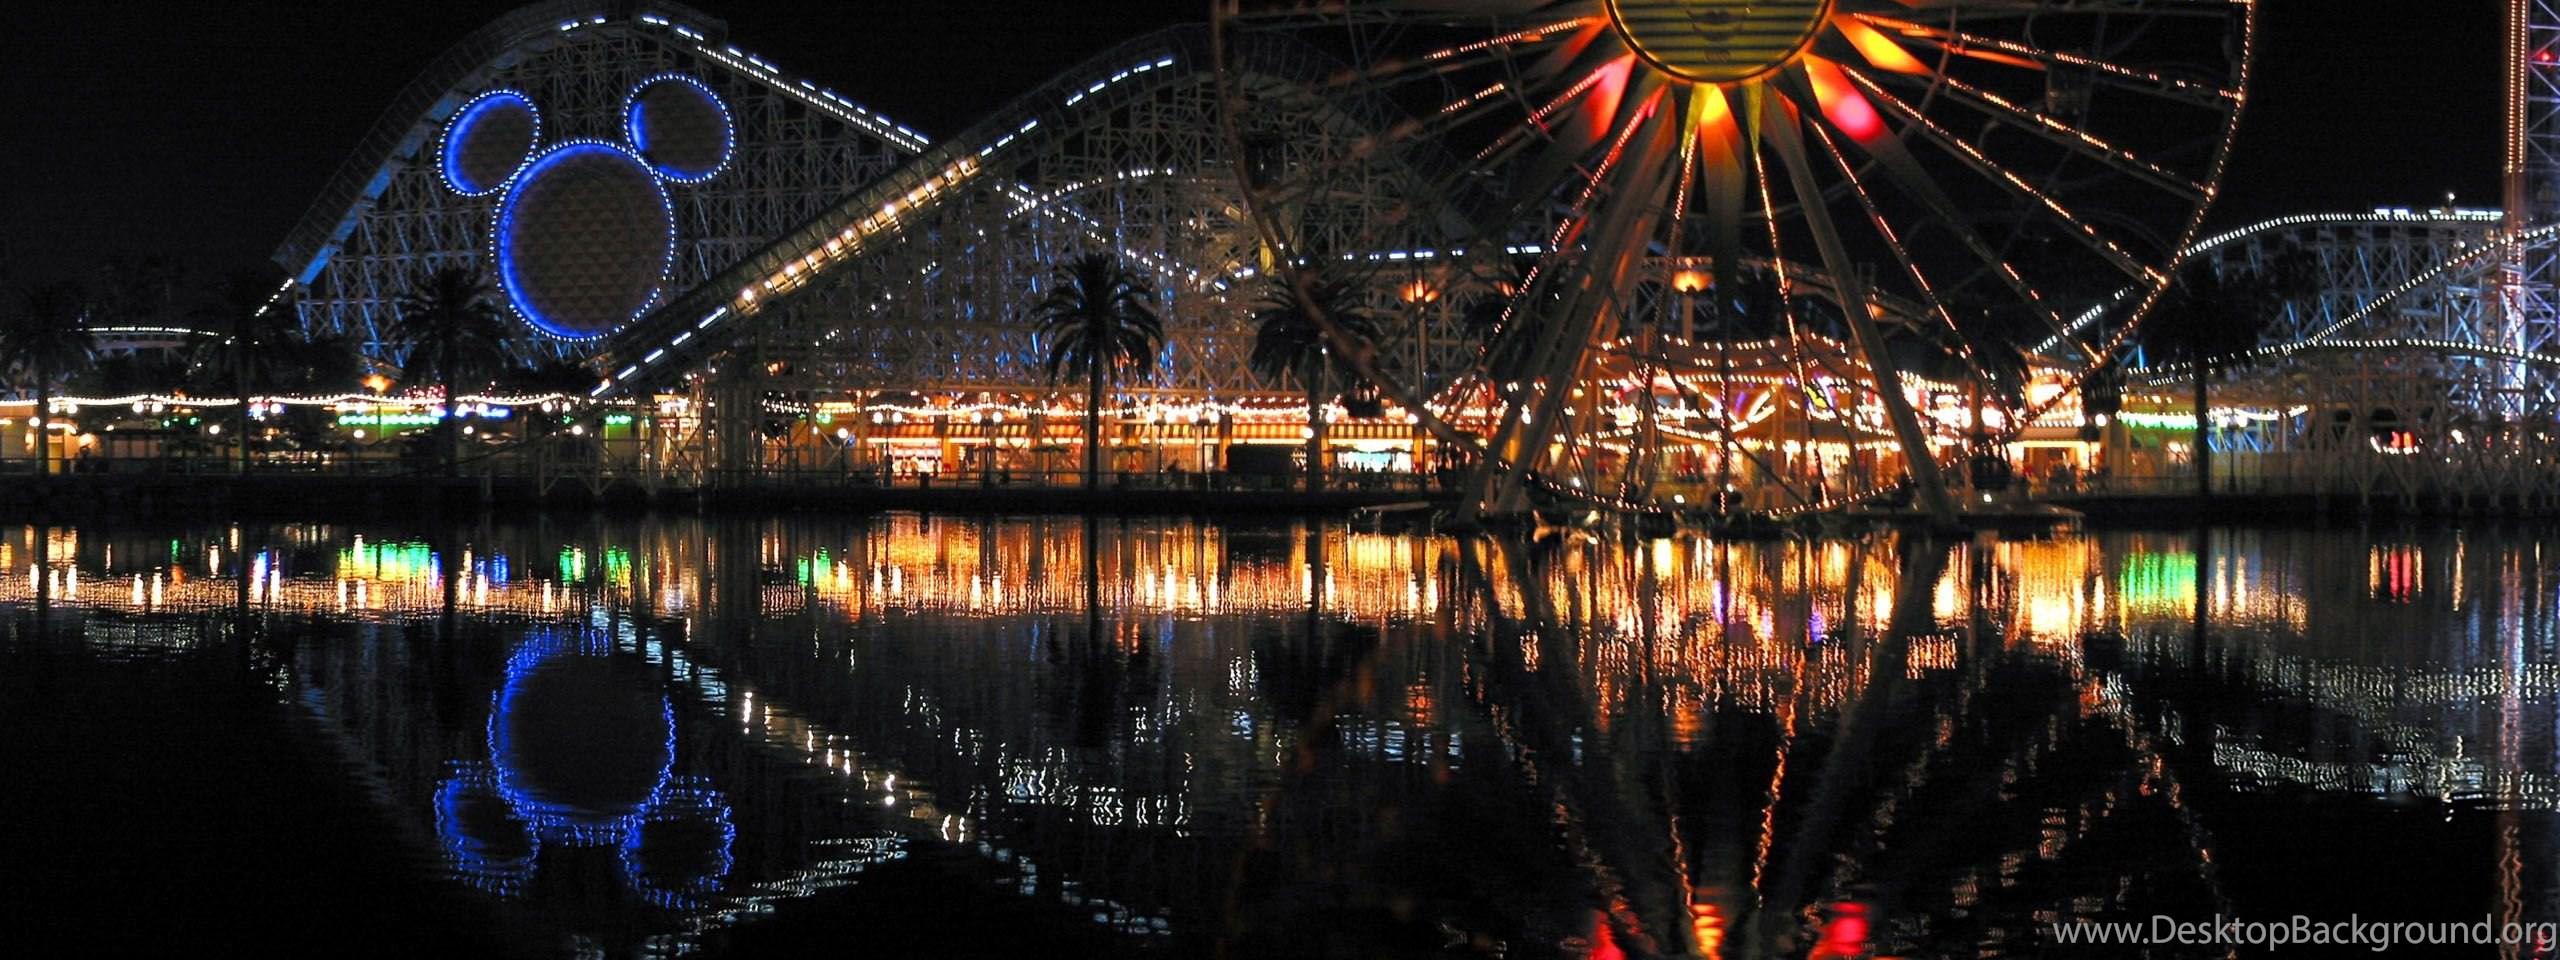 Panoramic Disneyland And Disneyworld Pictures & Satellite Maps